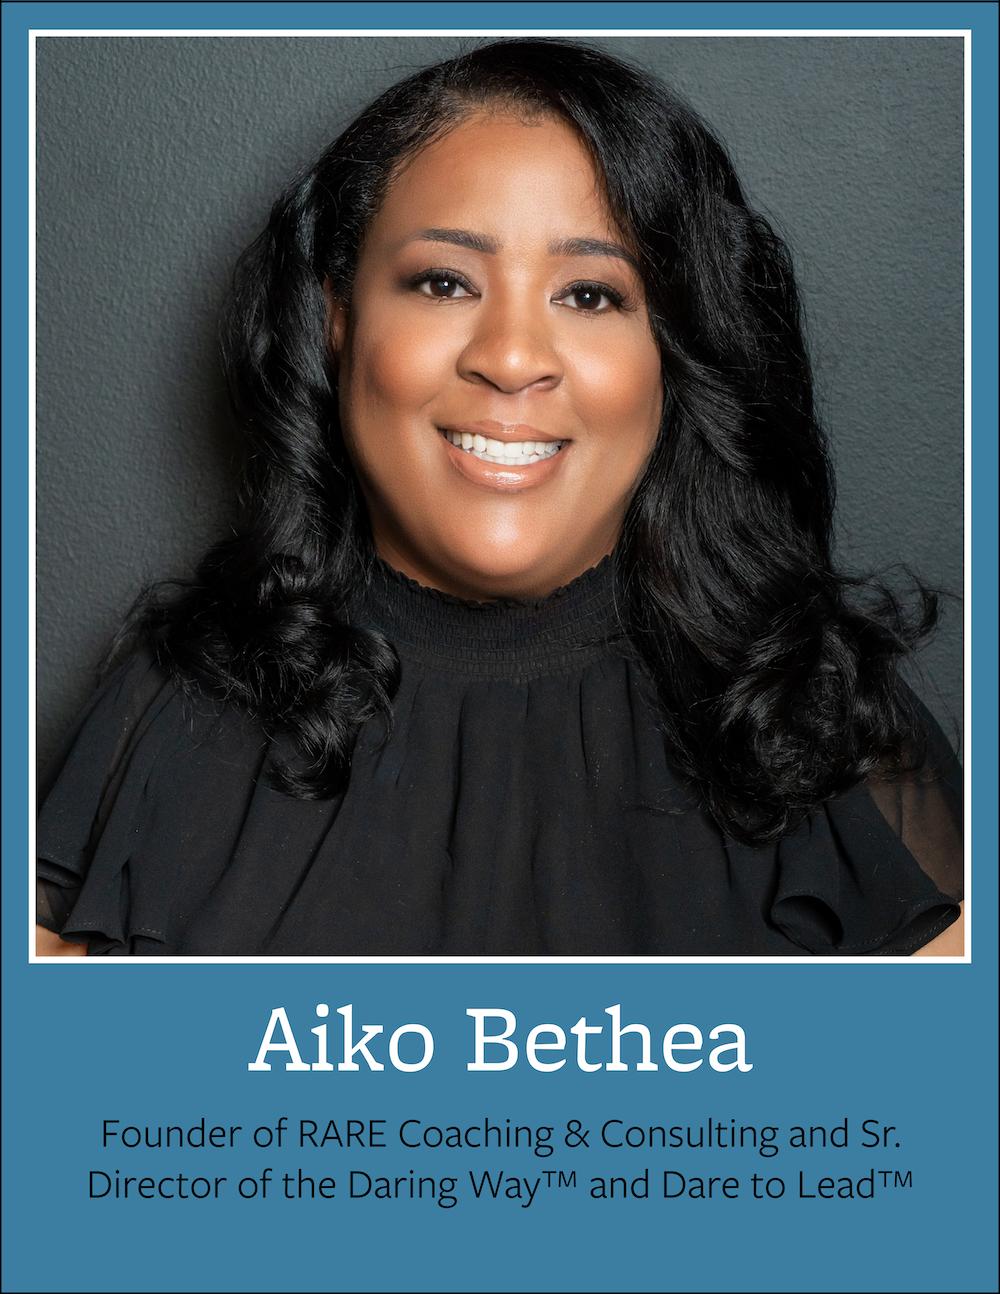 Aiko Bethea Headshot